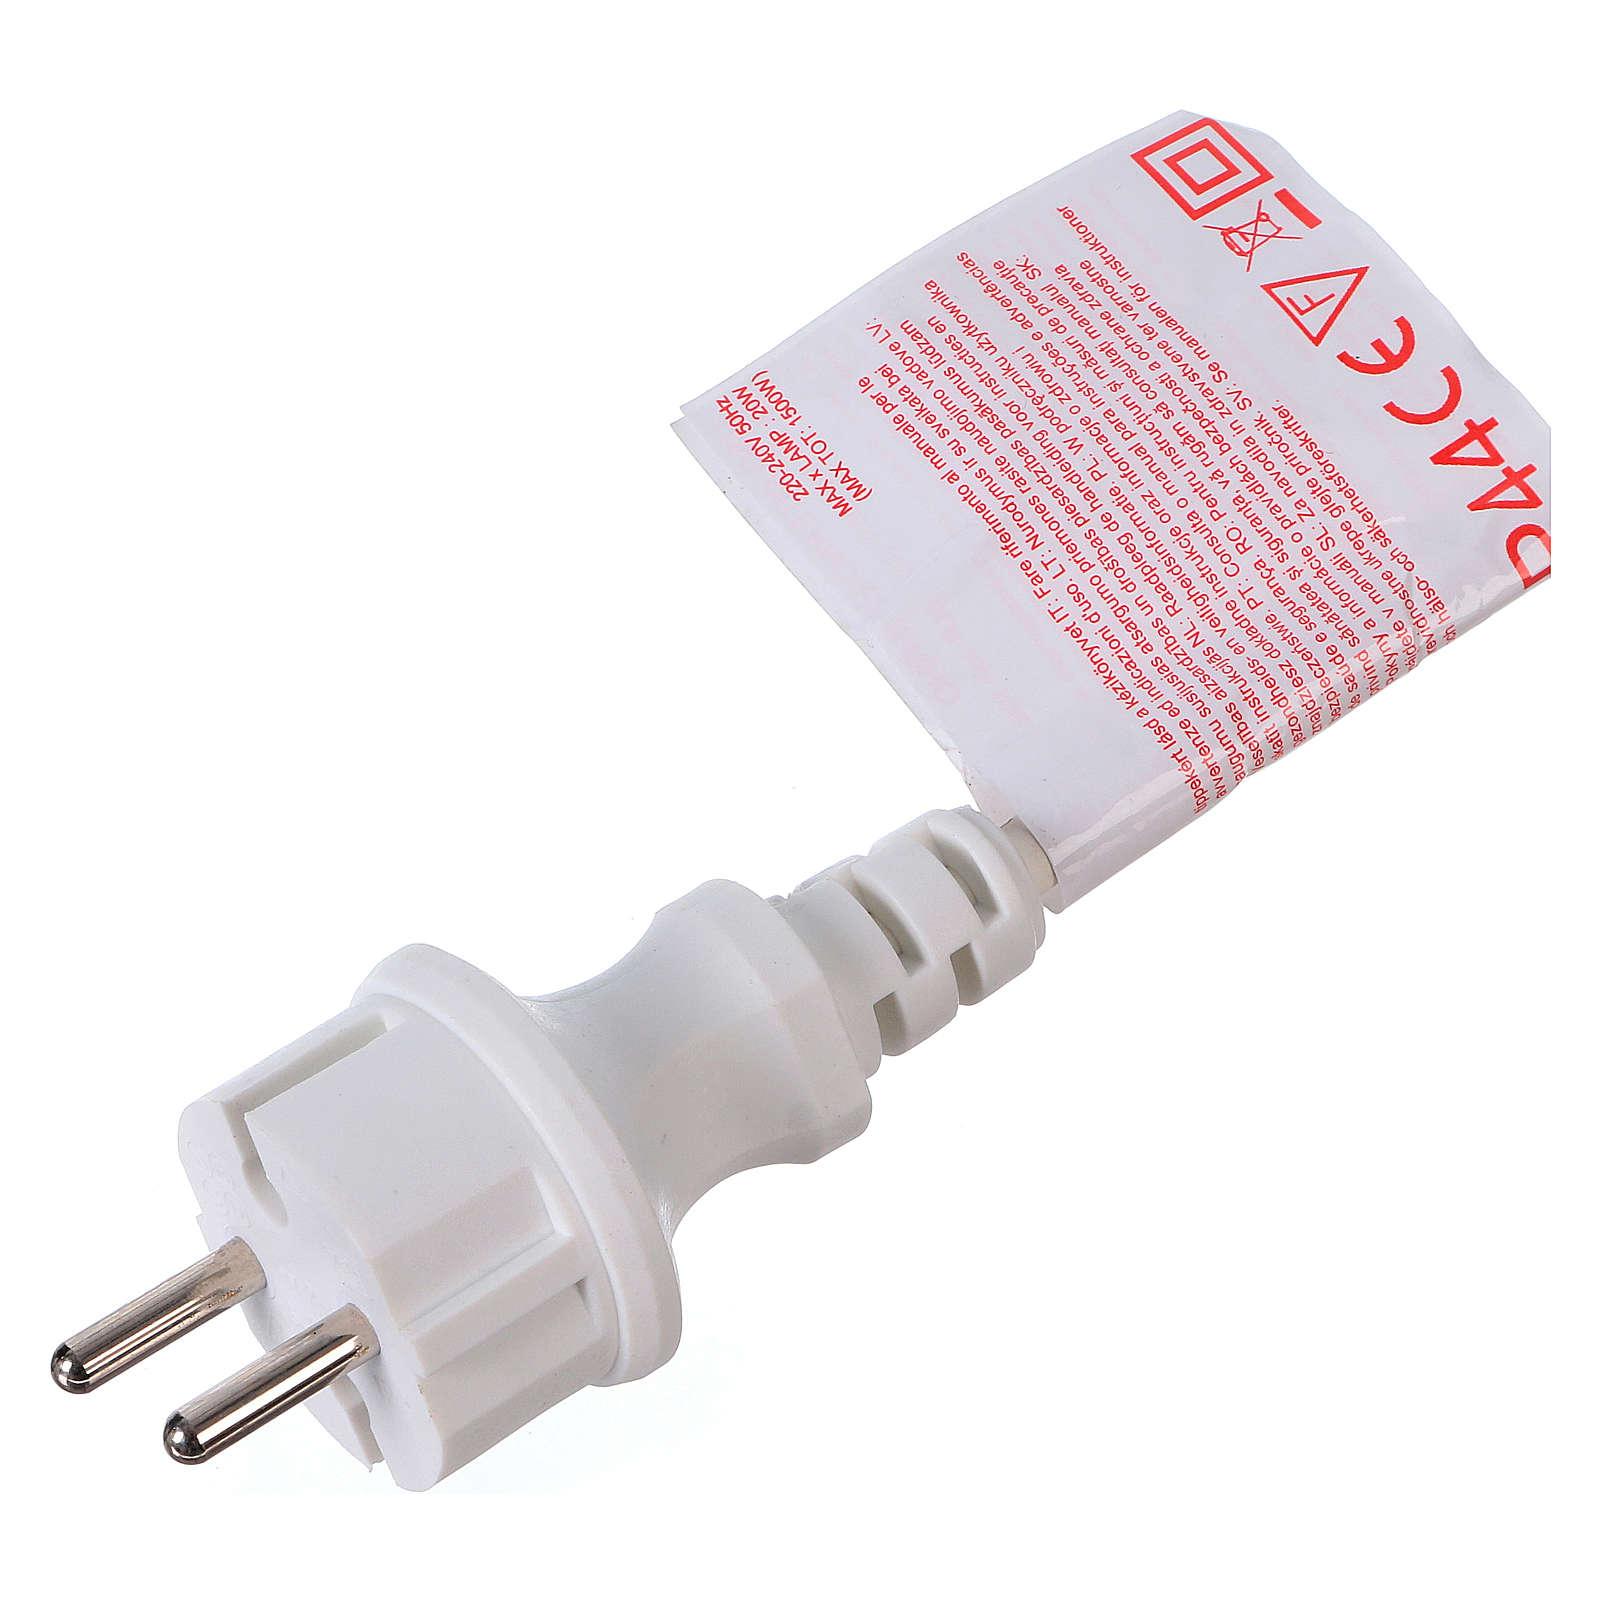 Christmas lights bulb holder E27 10 m white cable 3